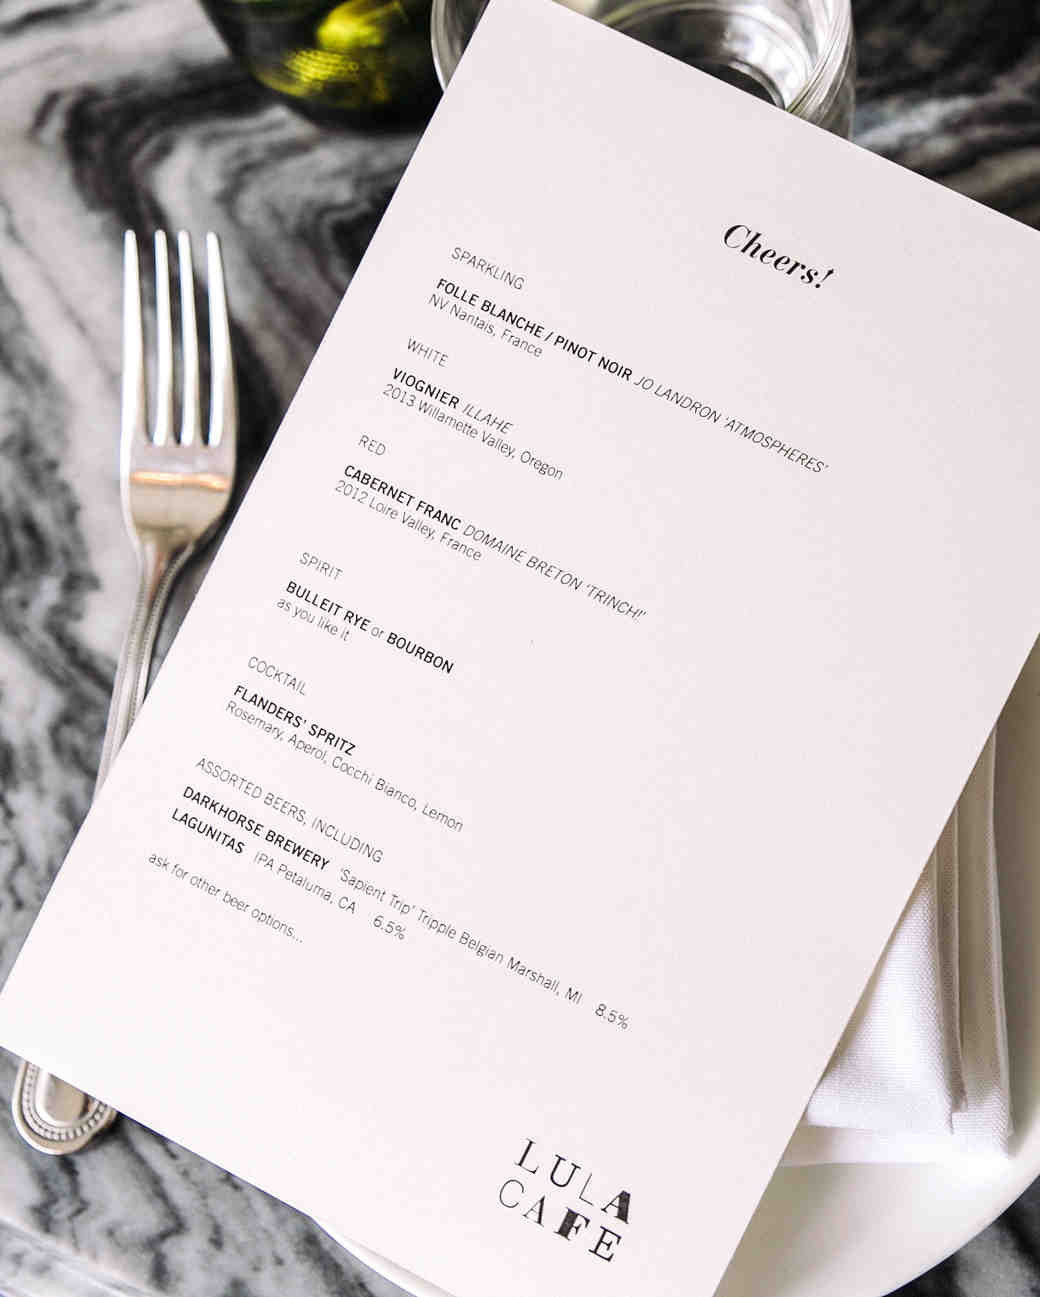 sadie-brandon-wedding-menu-79-ss112173-0915.jpg